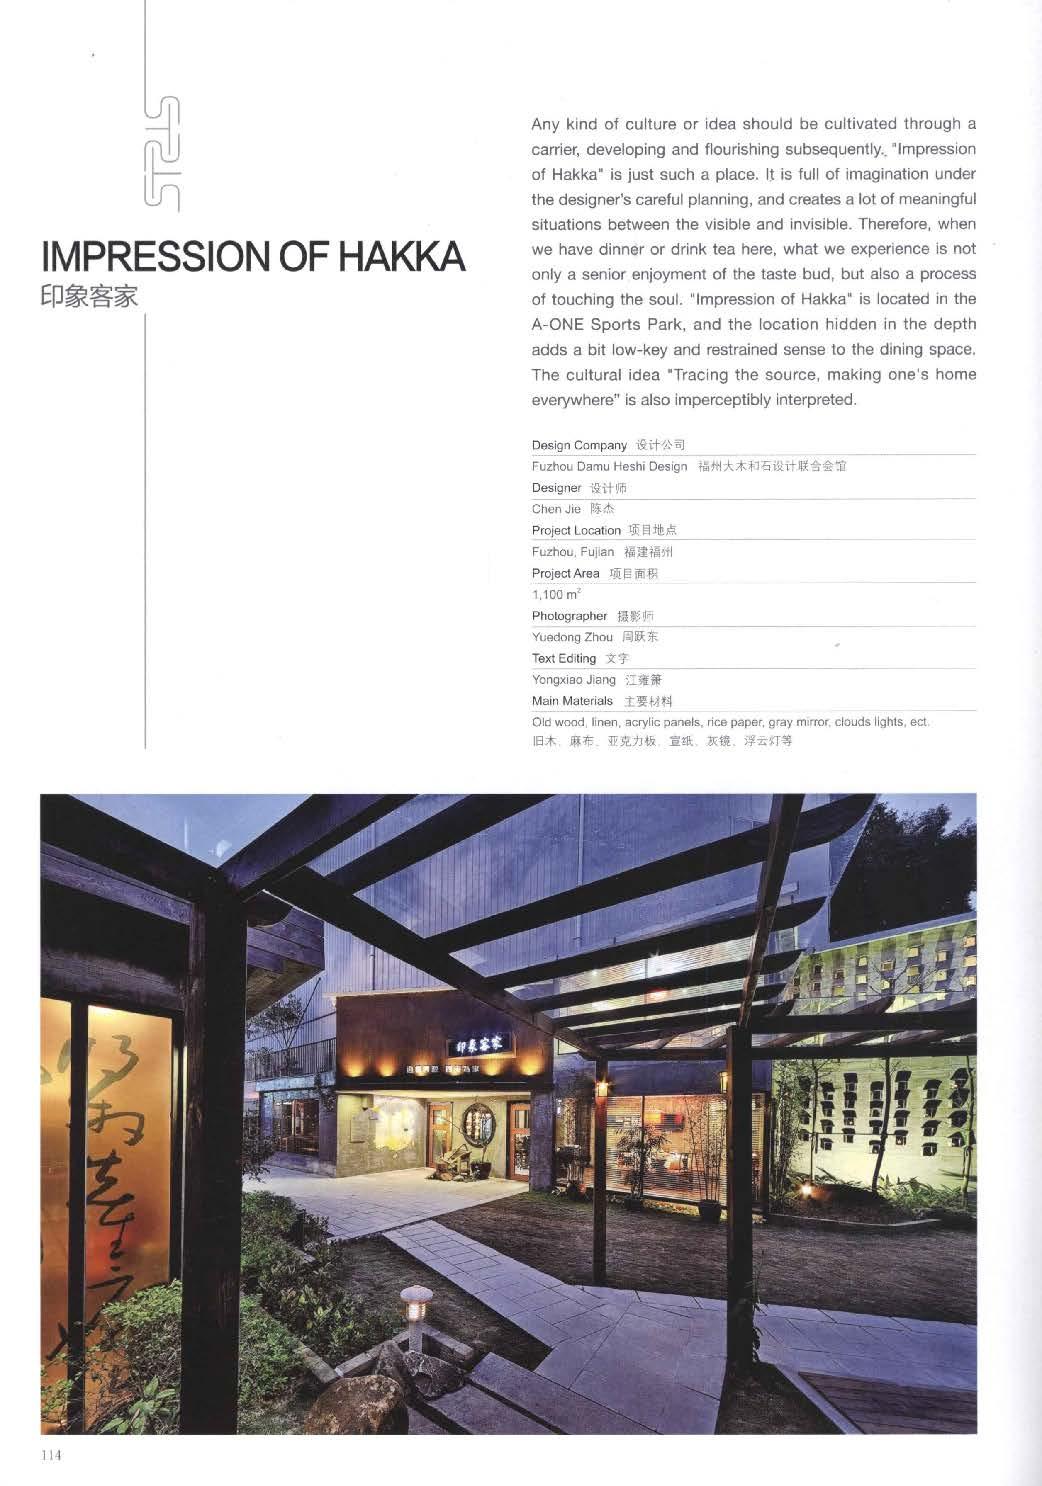 H073 东方风情 会所、餐饮细部解析_Page_112.jpg